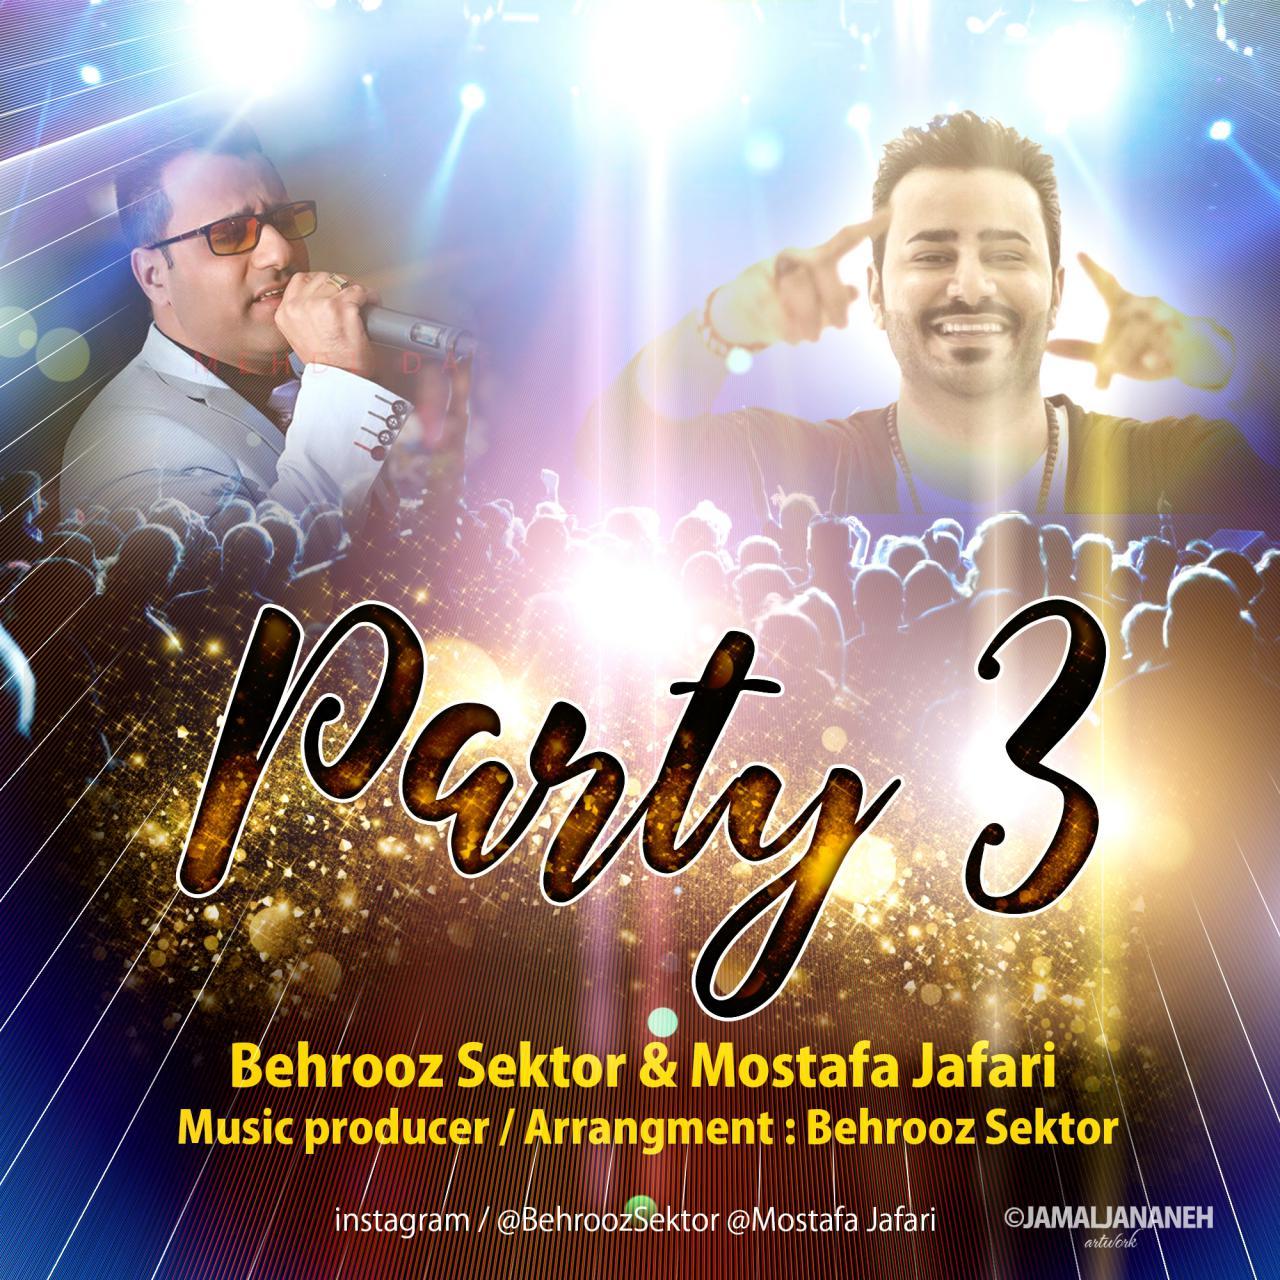 Behrooz Sektor - Party 3 Music   آهنگ بهروز سکتور و مصطفی جعفری - پارتی 3